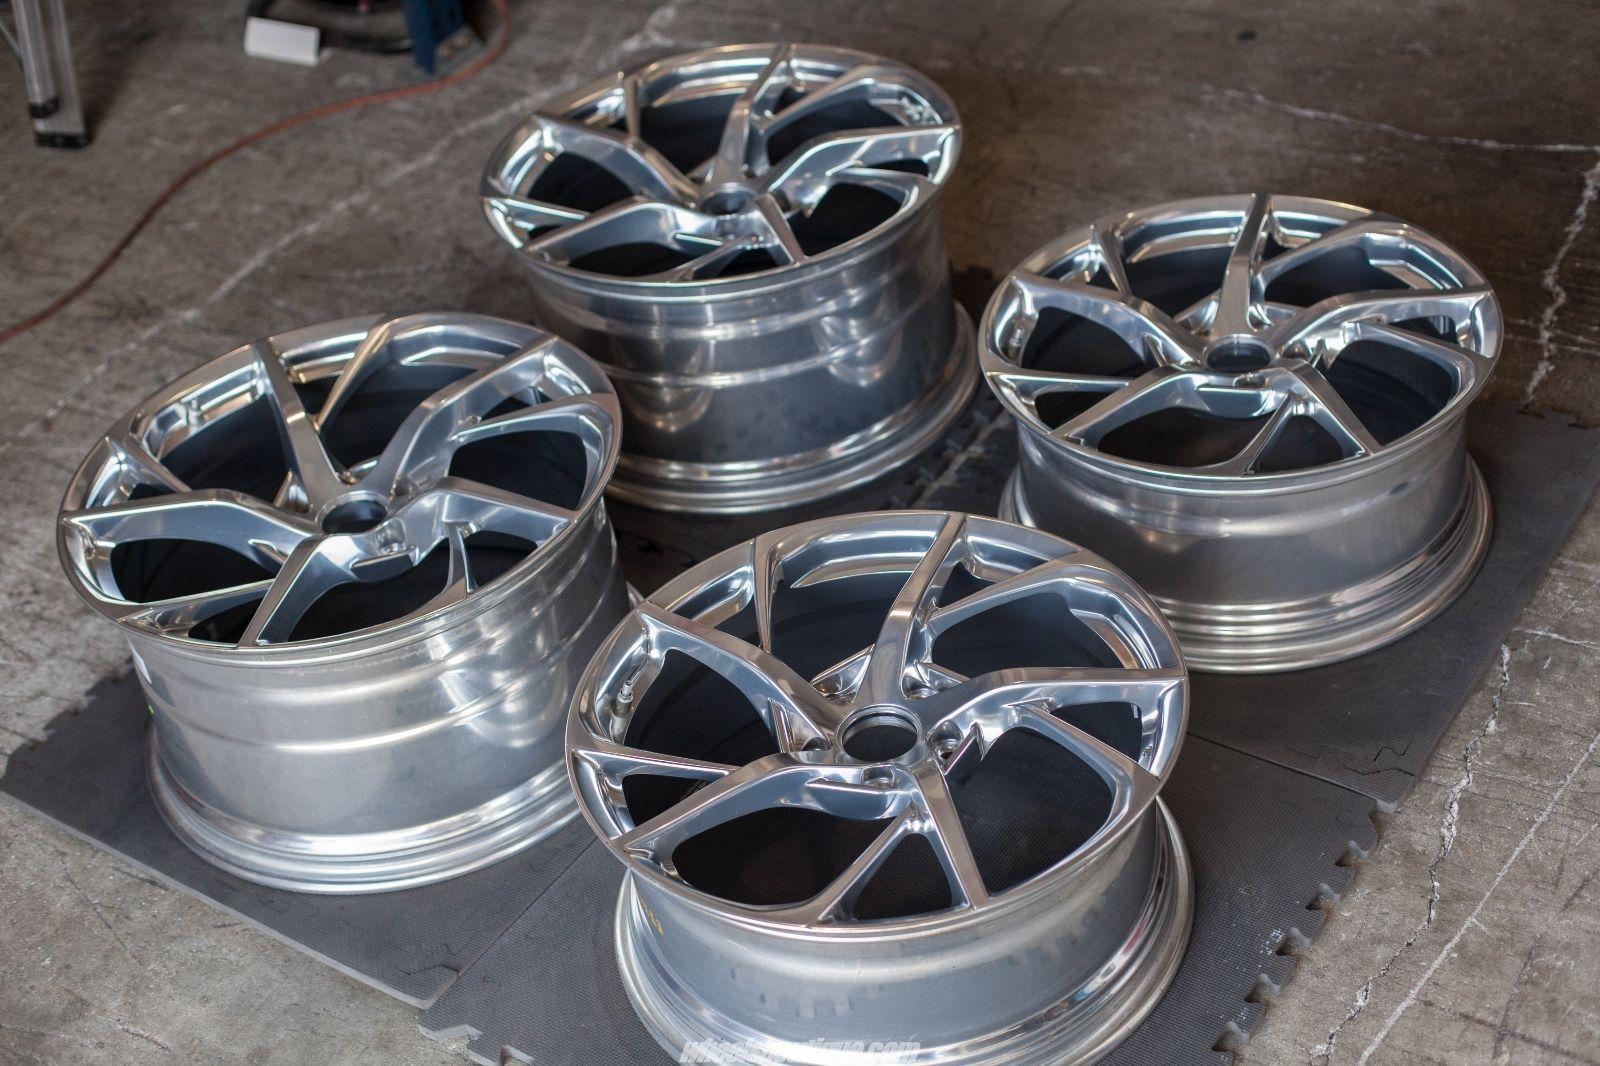 throtl 2017 acura nsx factory oem wheels 19 20 exclusive